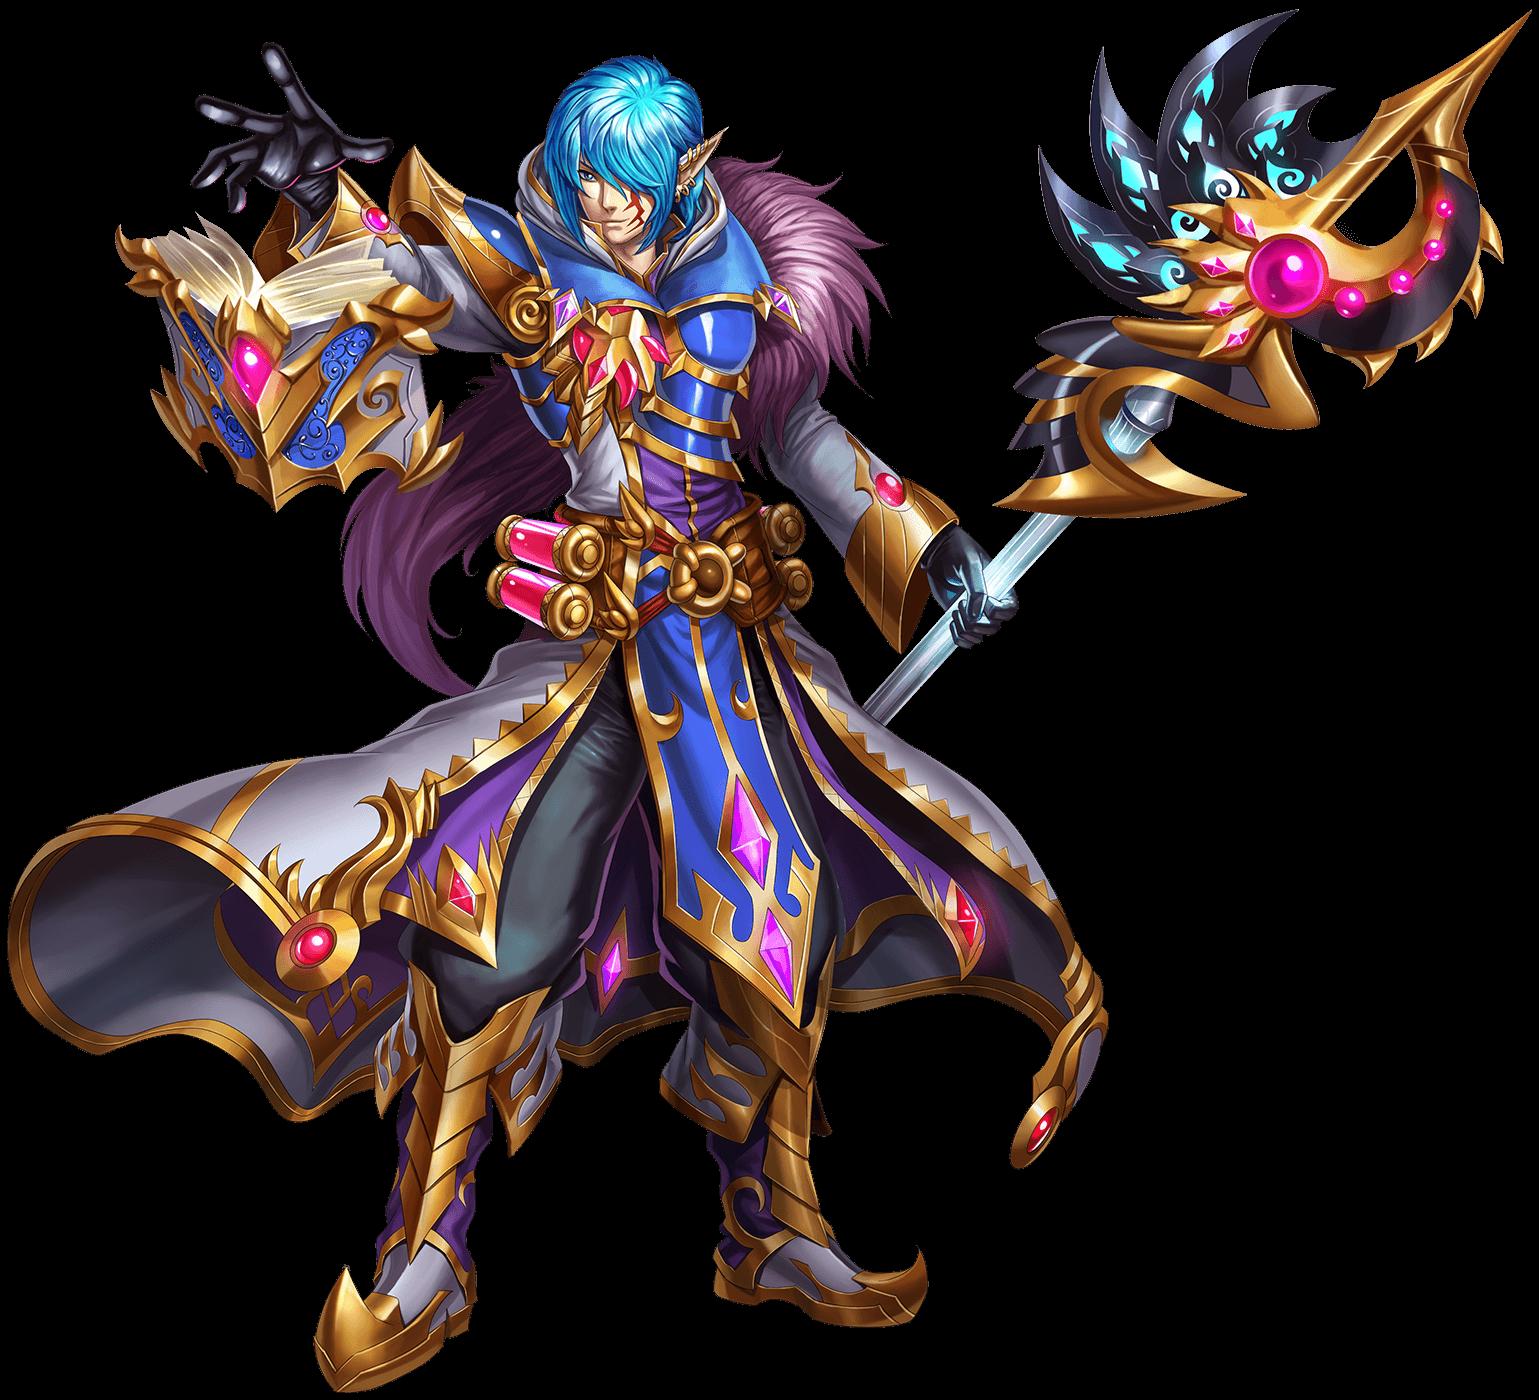 Allanon (character) | Brave Frontier Wiki | FANDOM powered